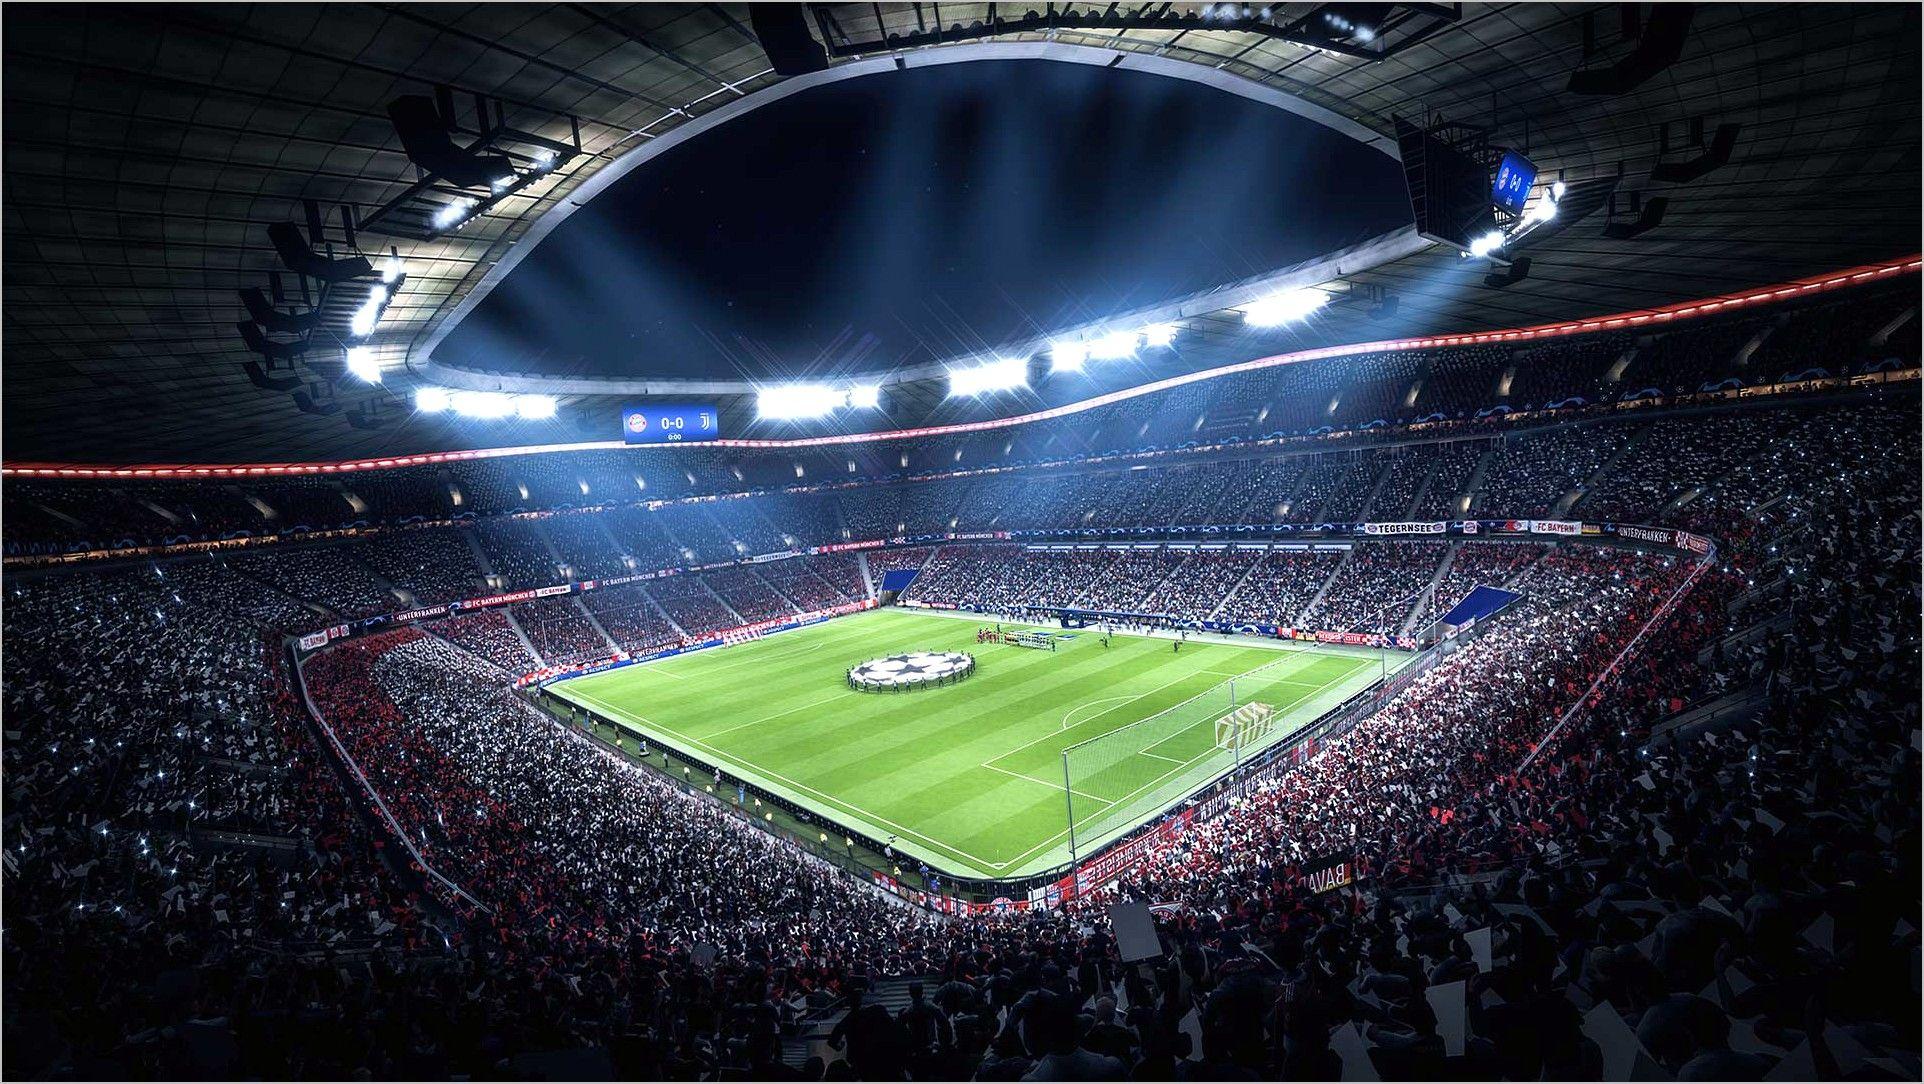 4k Wallpaper Fifa 19 In 2020 Uefa Champions League Ea Sports Fifa Fifa